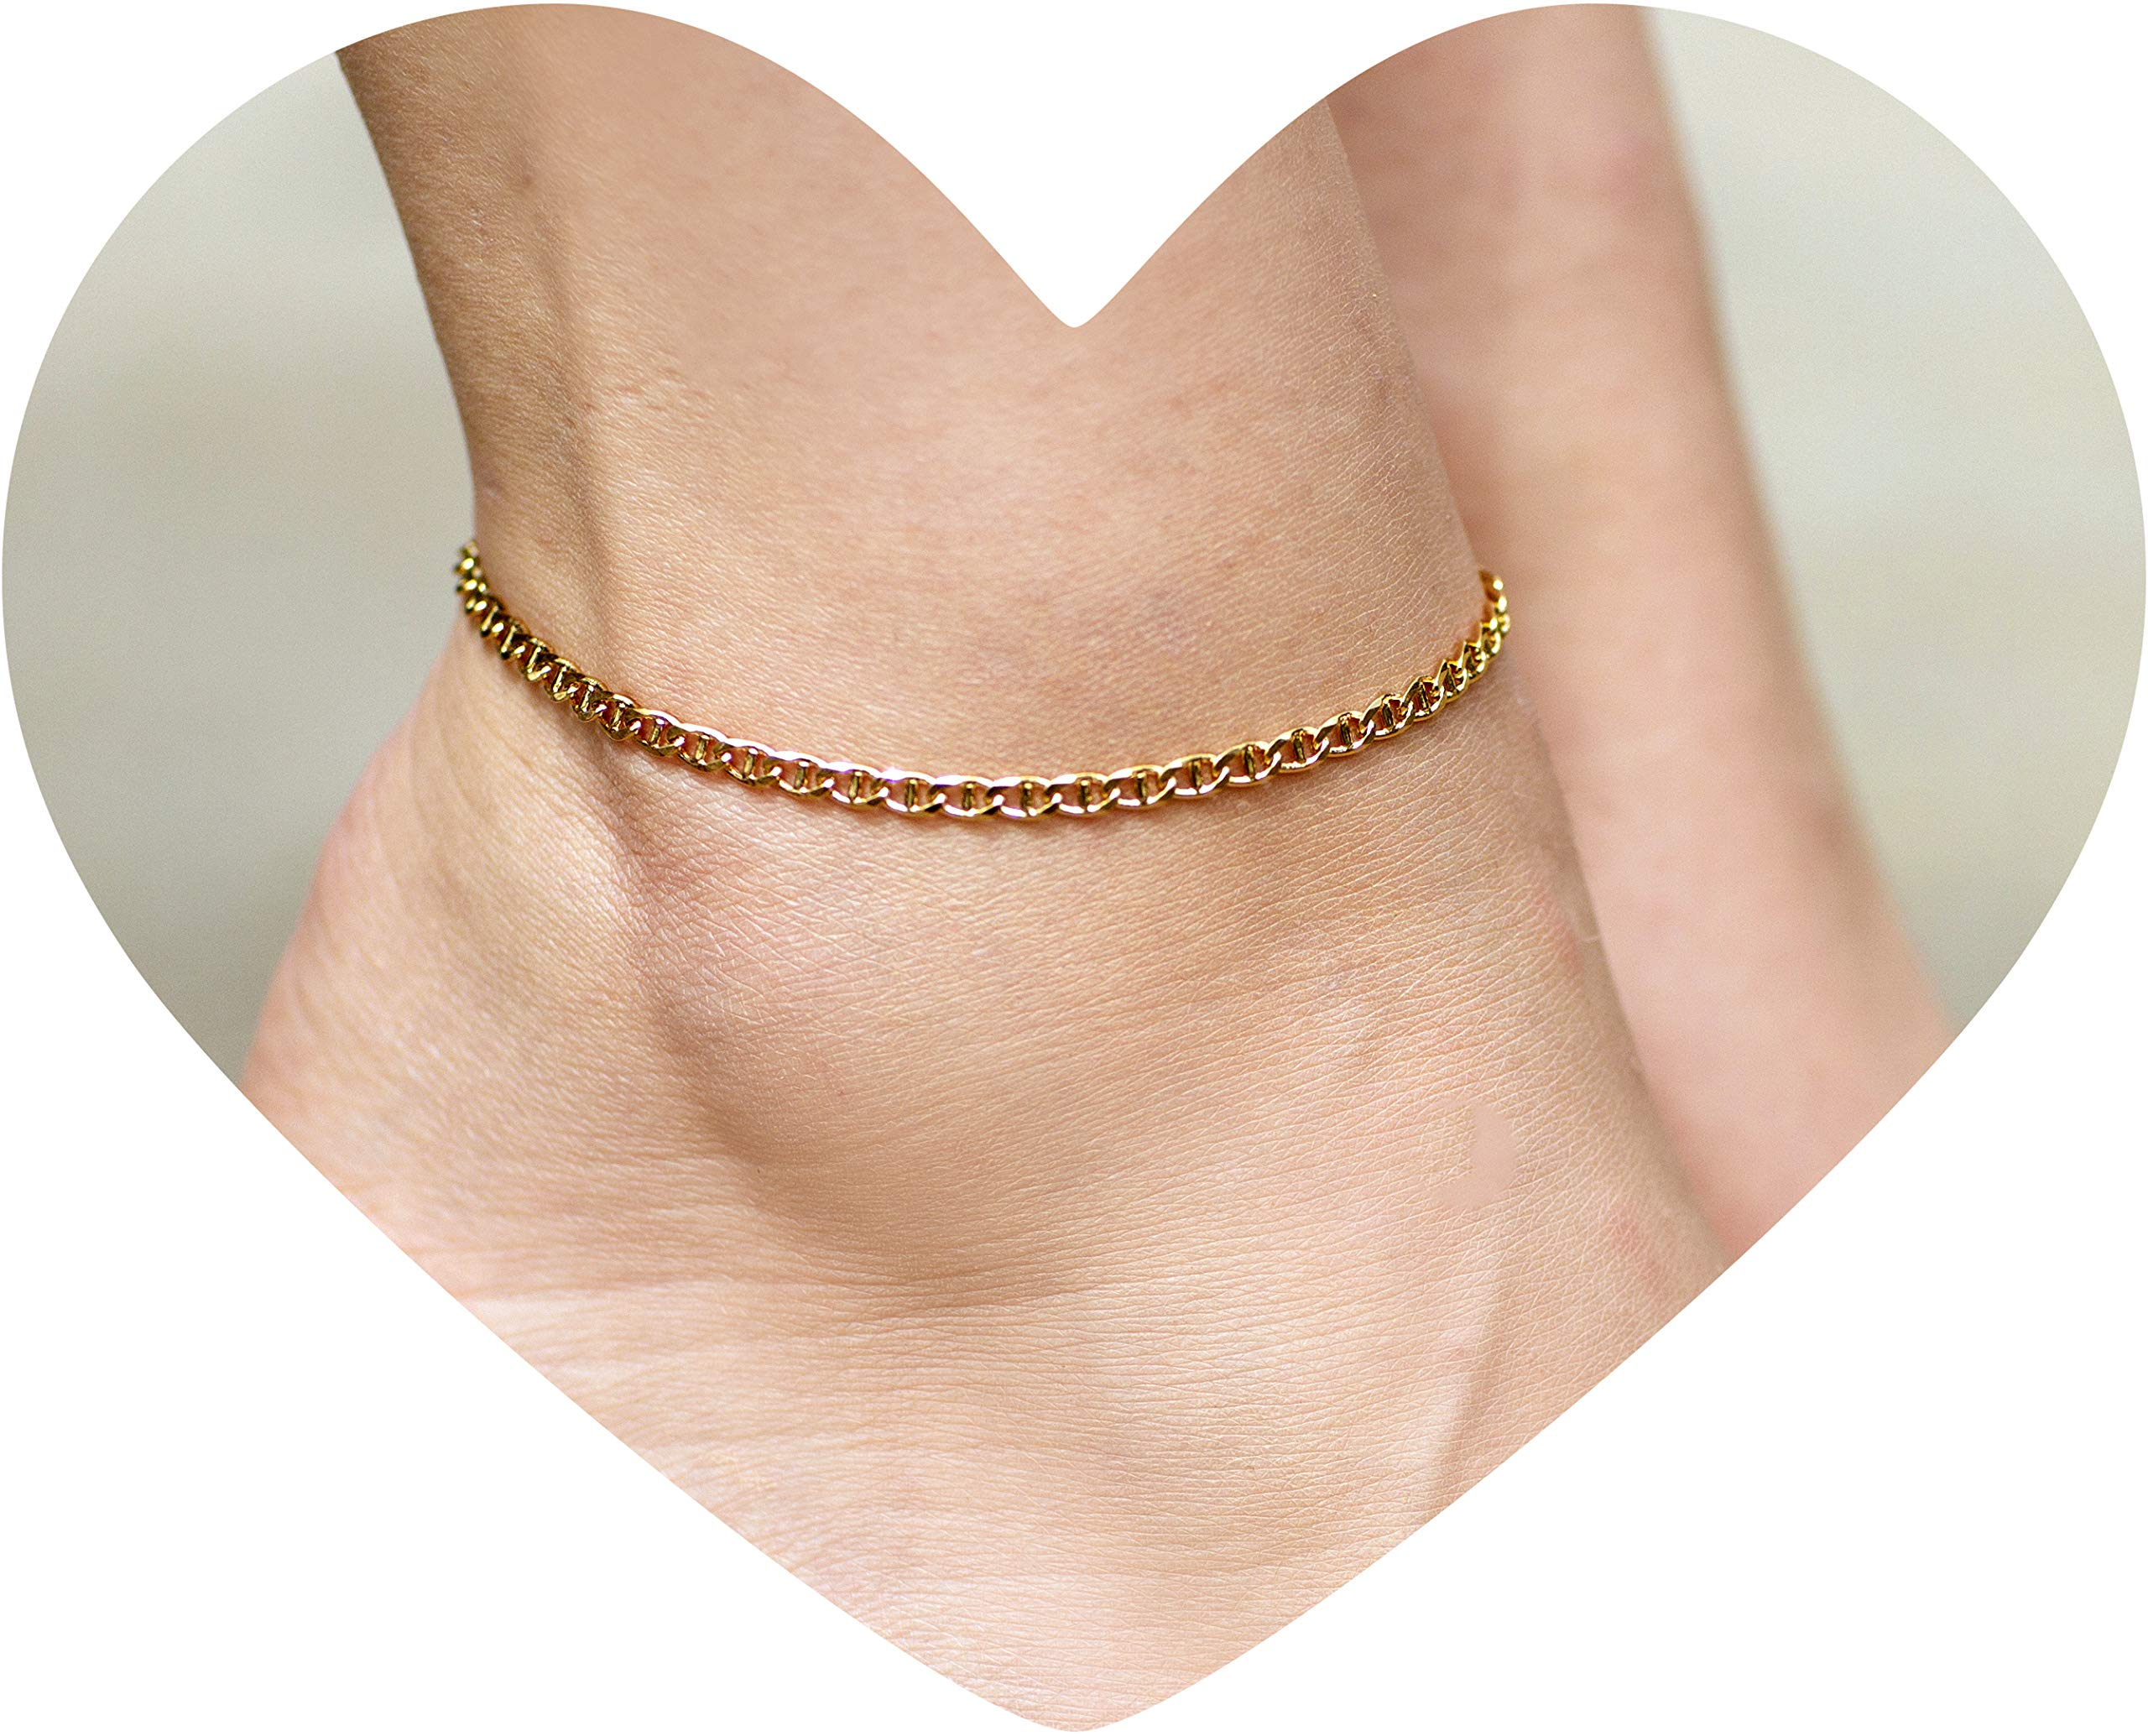 9-11 Pretty gold plated anklet with a black enamel diamond charm body jewellery ankle bracelets